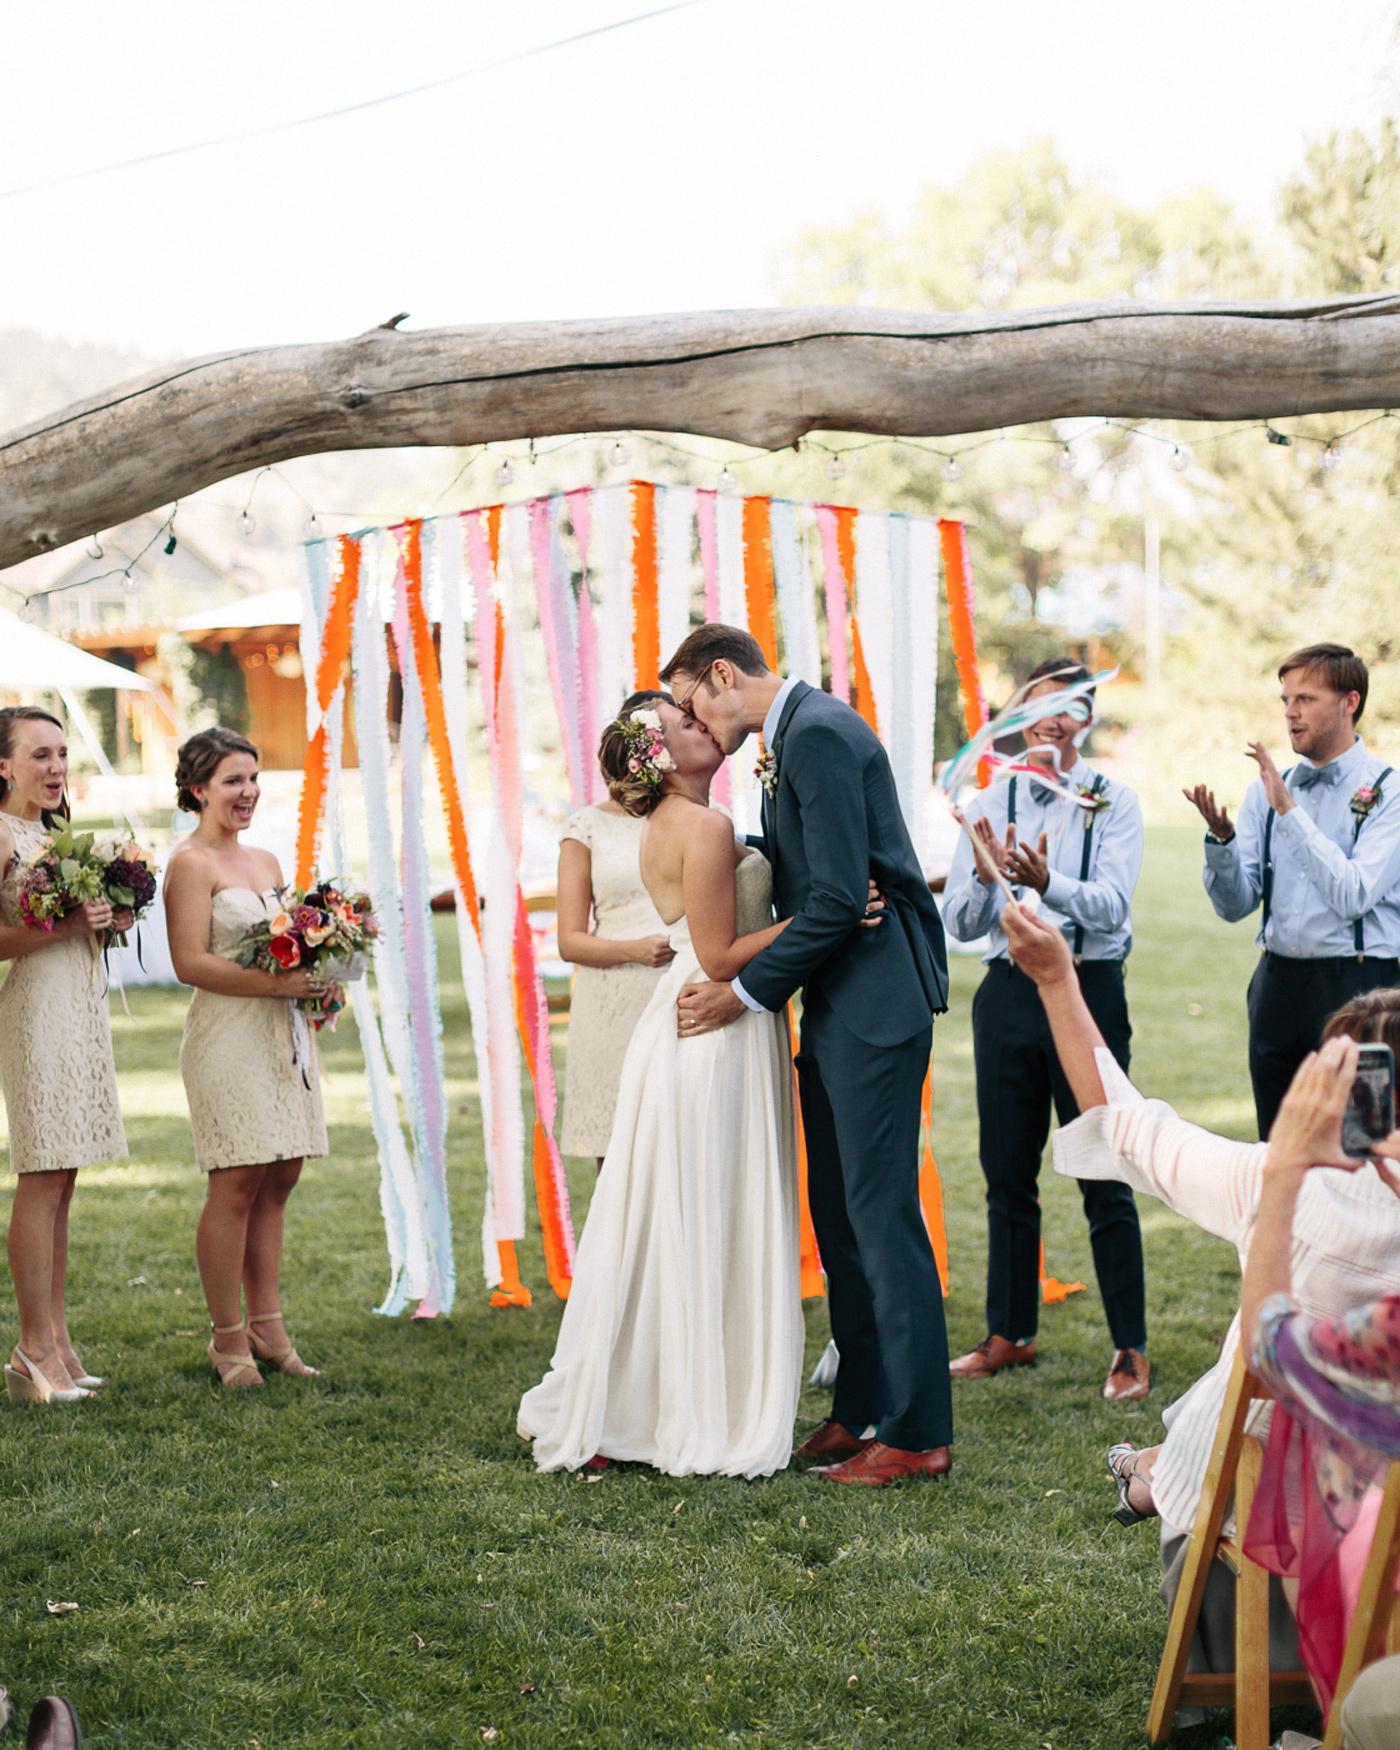 Lyons-Farmette-Wedding-Photographer-Lucy-Austin-Flash-Mob-Dance-26.jpg